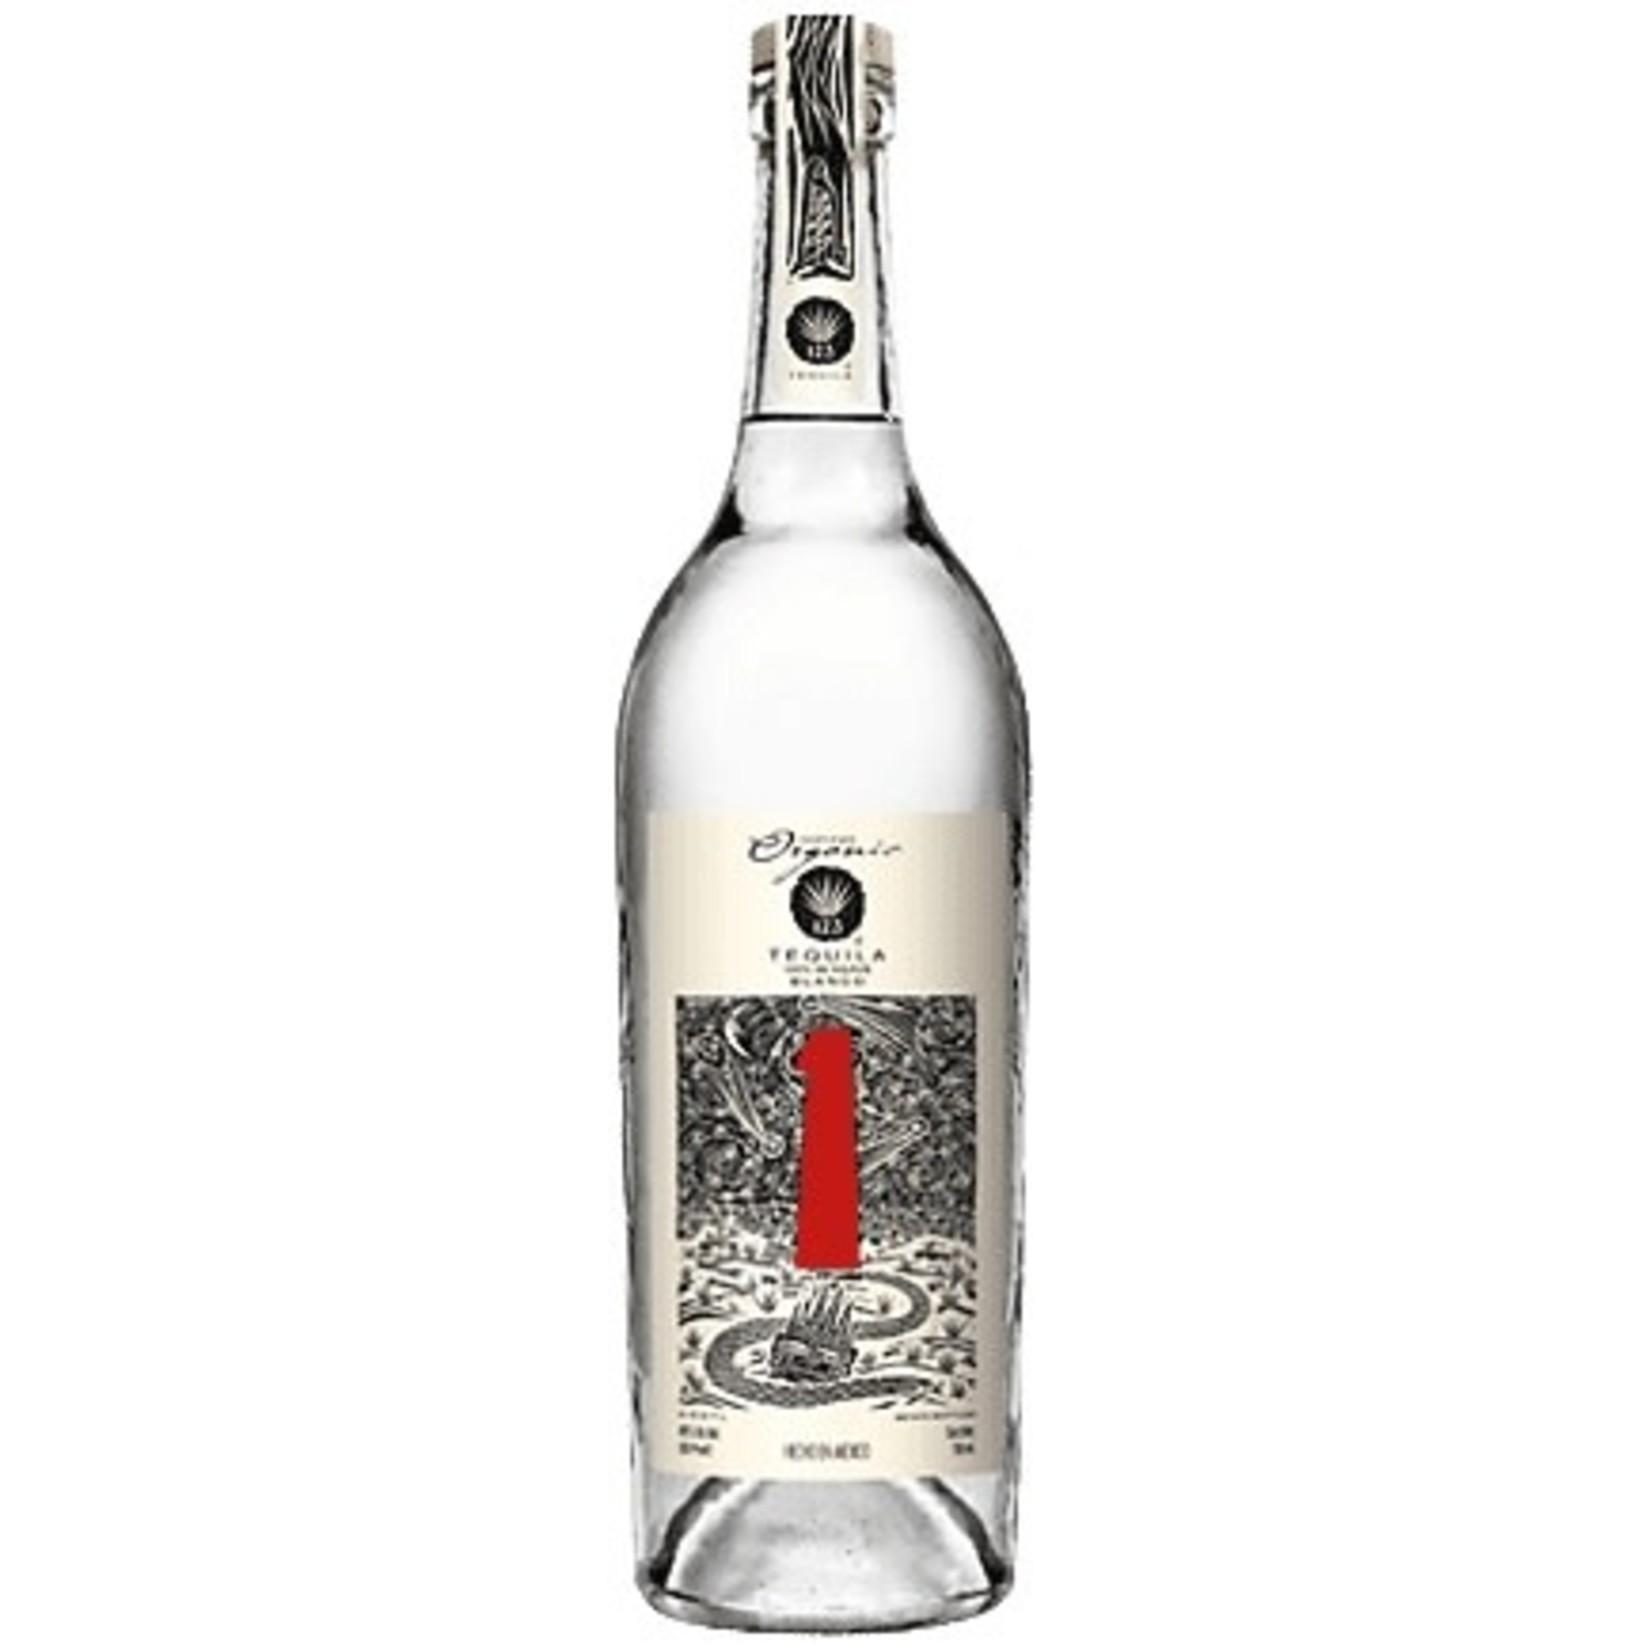 Spirits 123 #1 Blanco Tequila